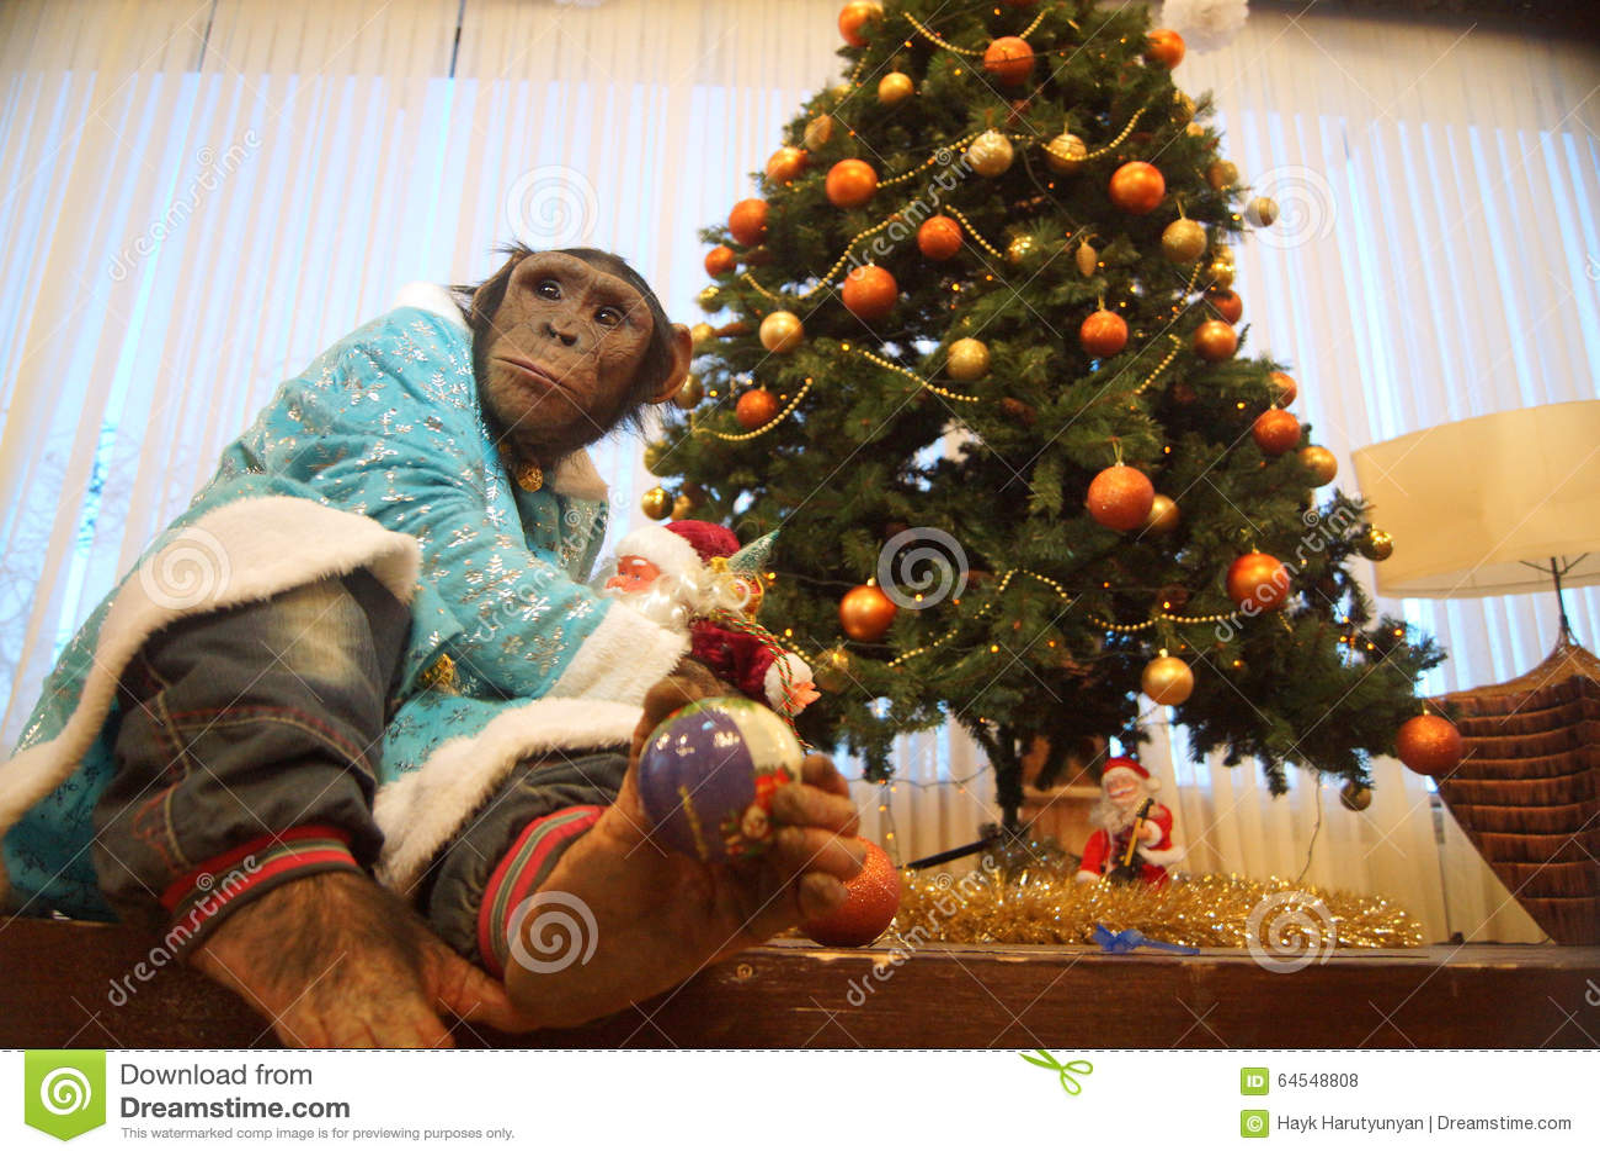 Monkey With Christmas Tree Stock Photo Image 64548808